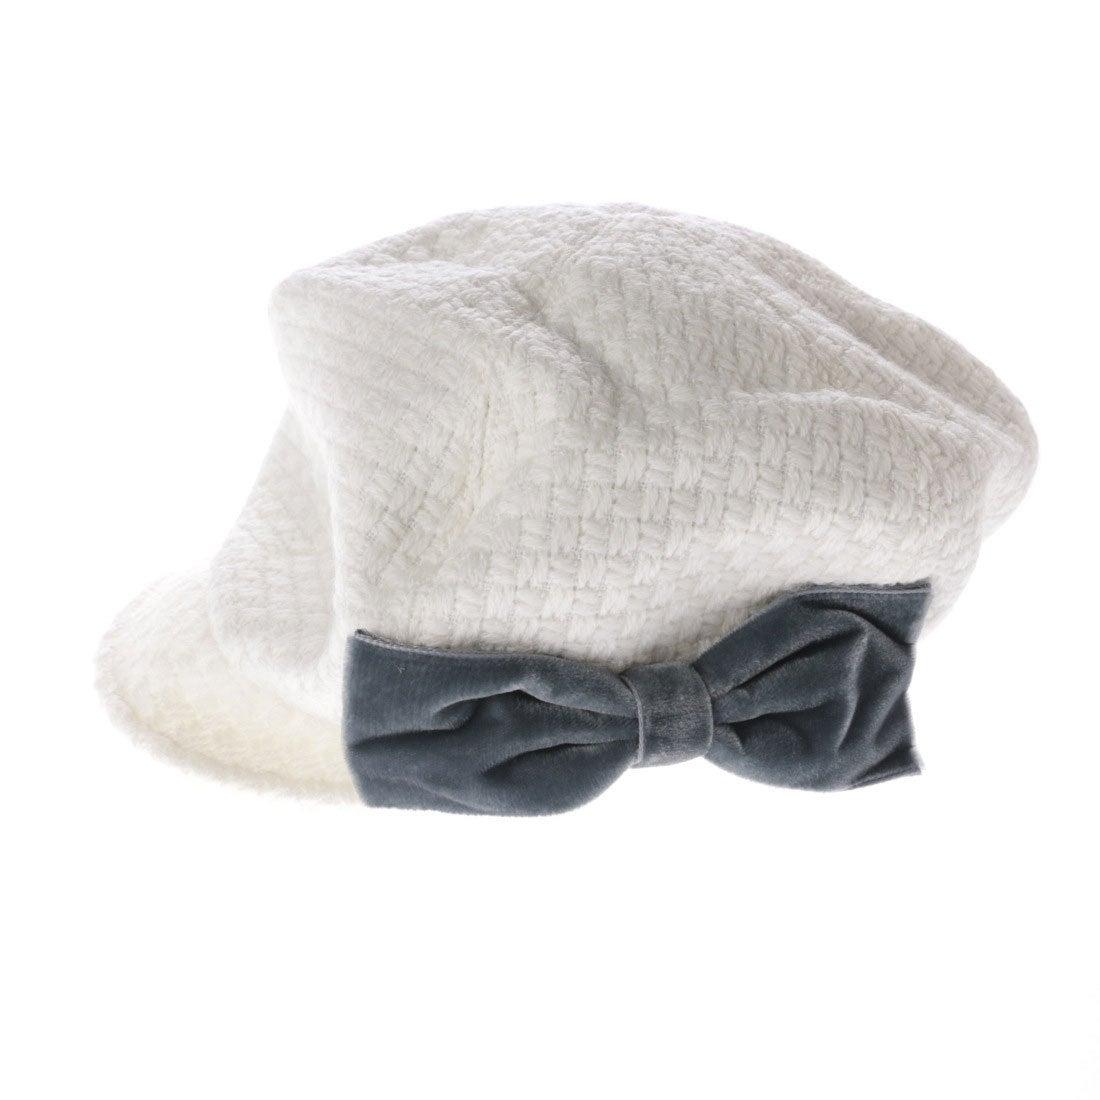 【SALE 80%OFF】セレク コレクション CELEC COLLECTION りぼんキャスケット帽子 (オフホワイト)